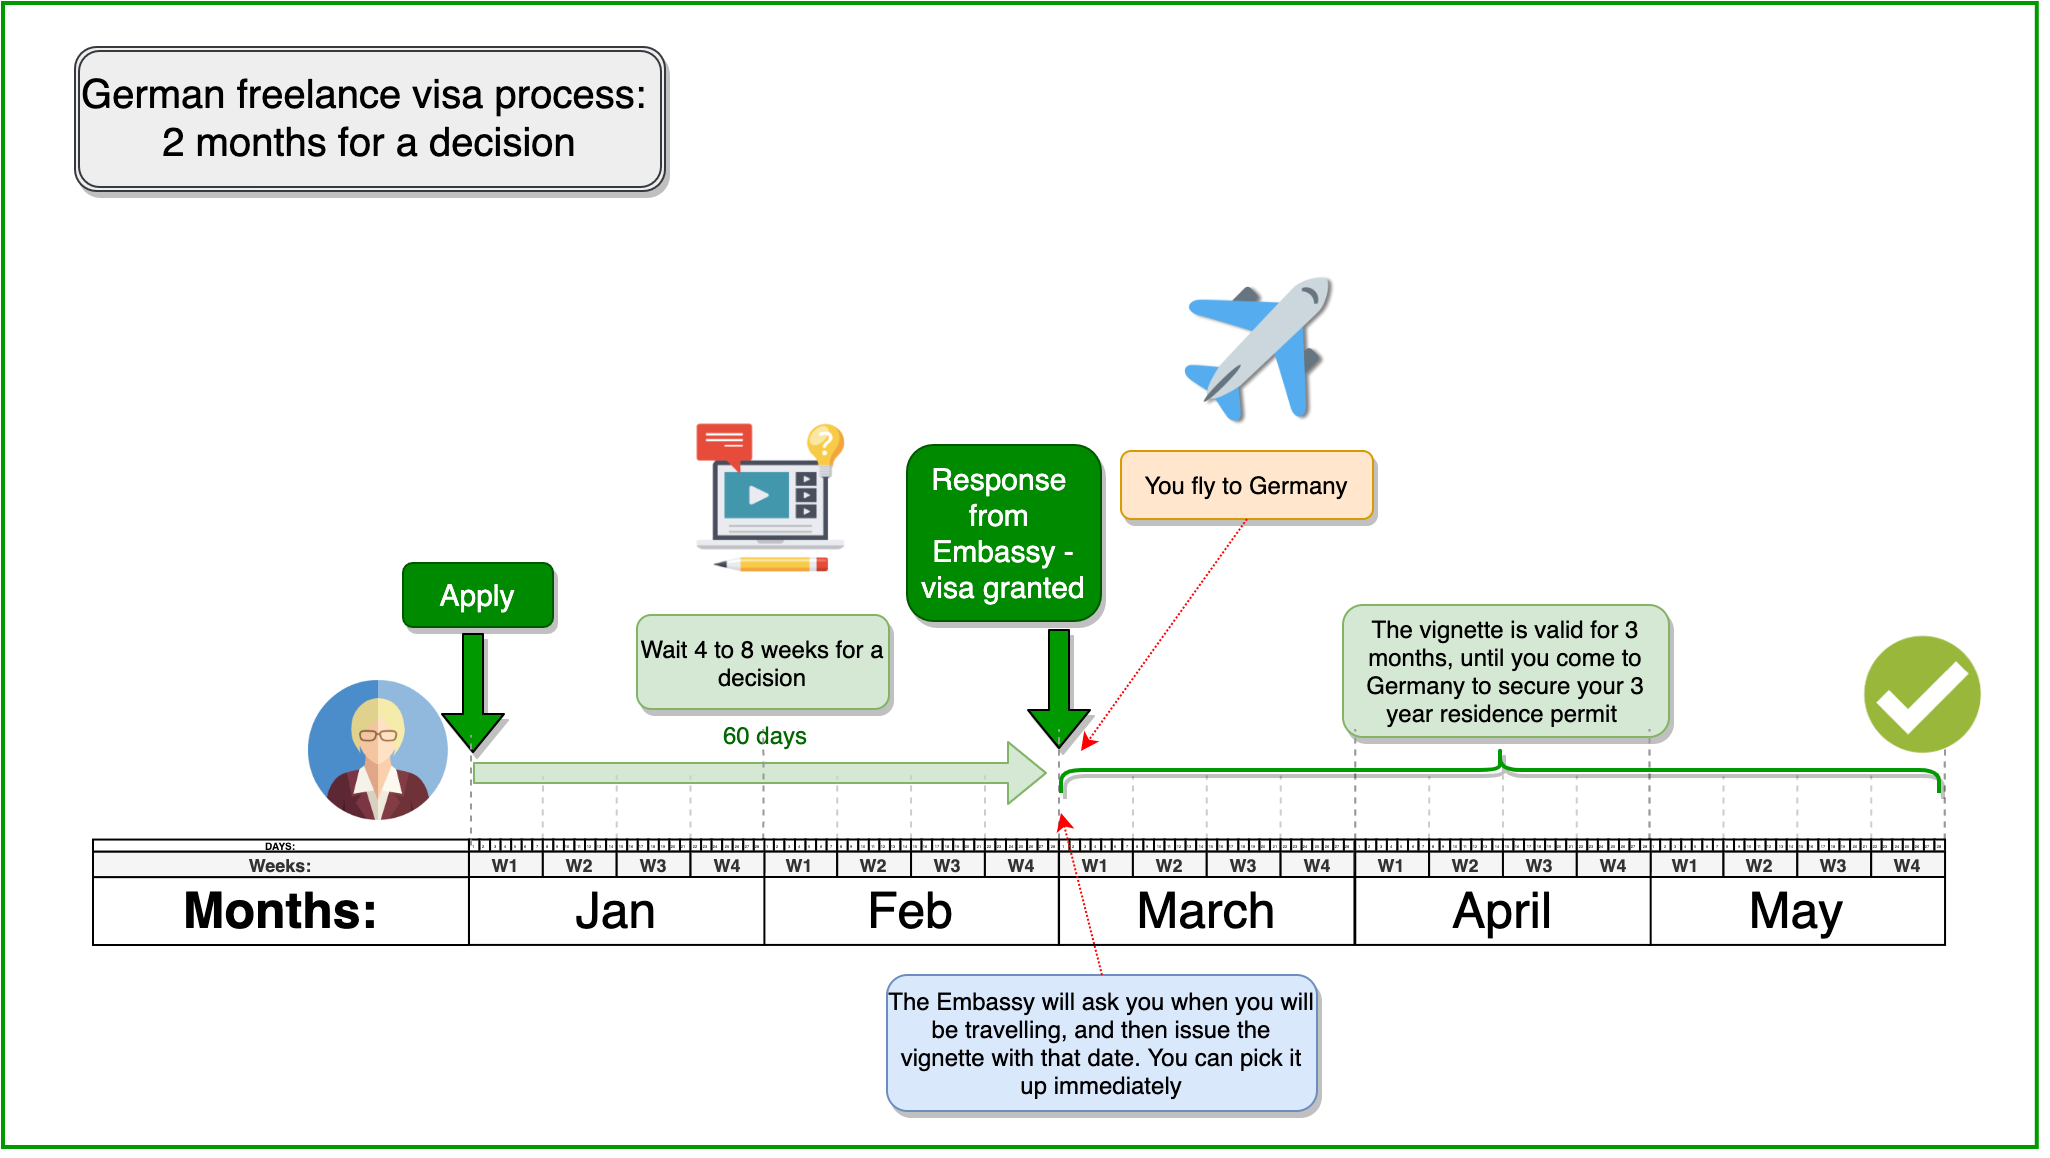 Application process for the German freelance visa